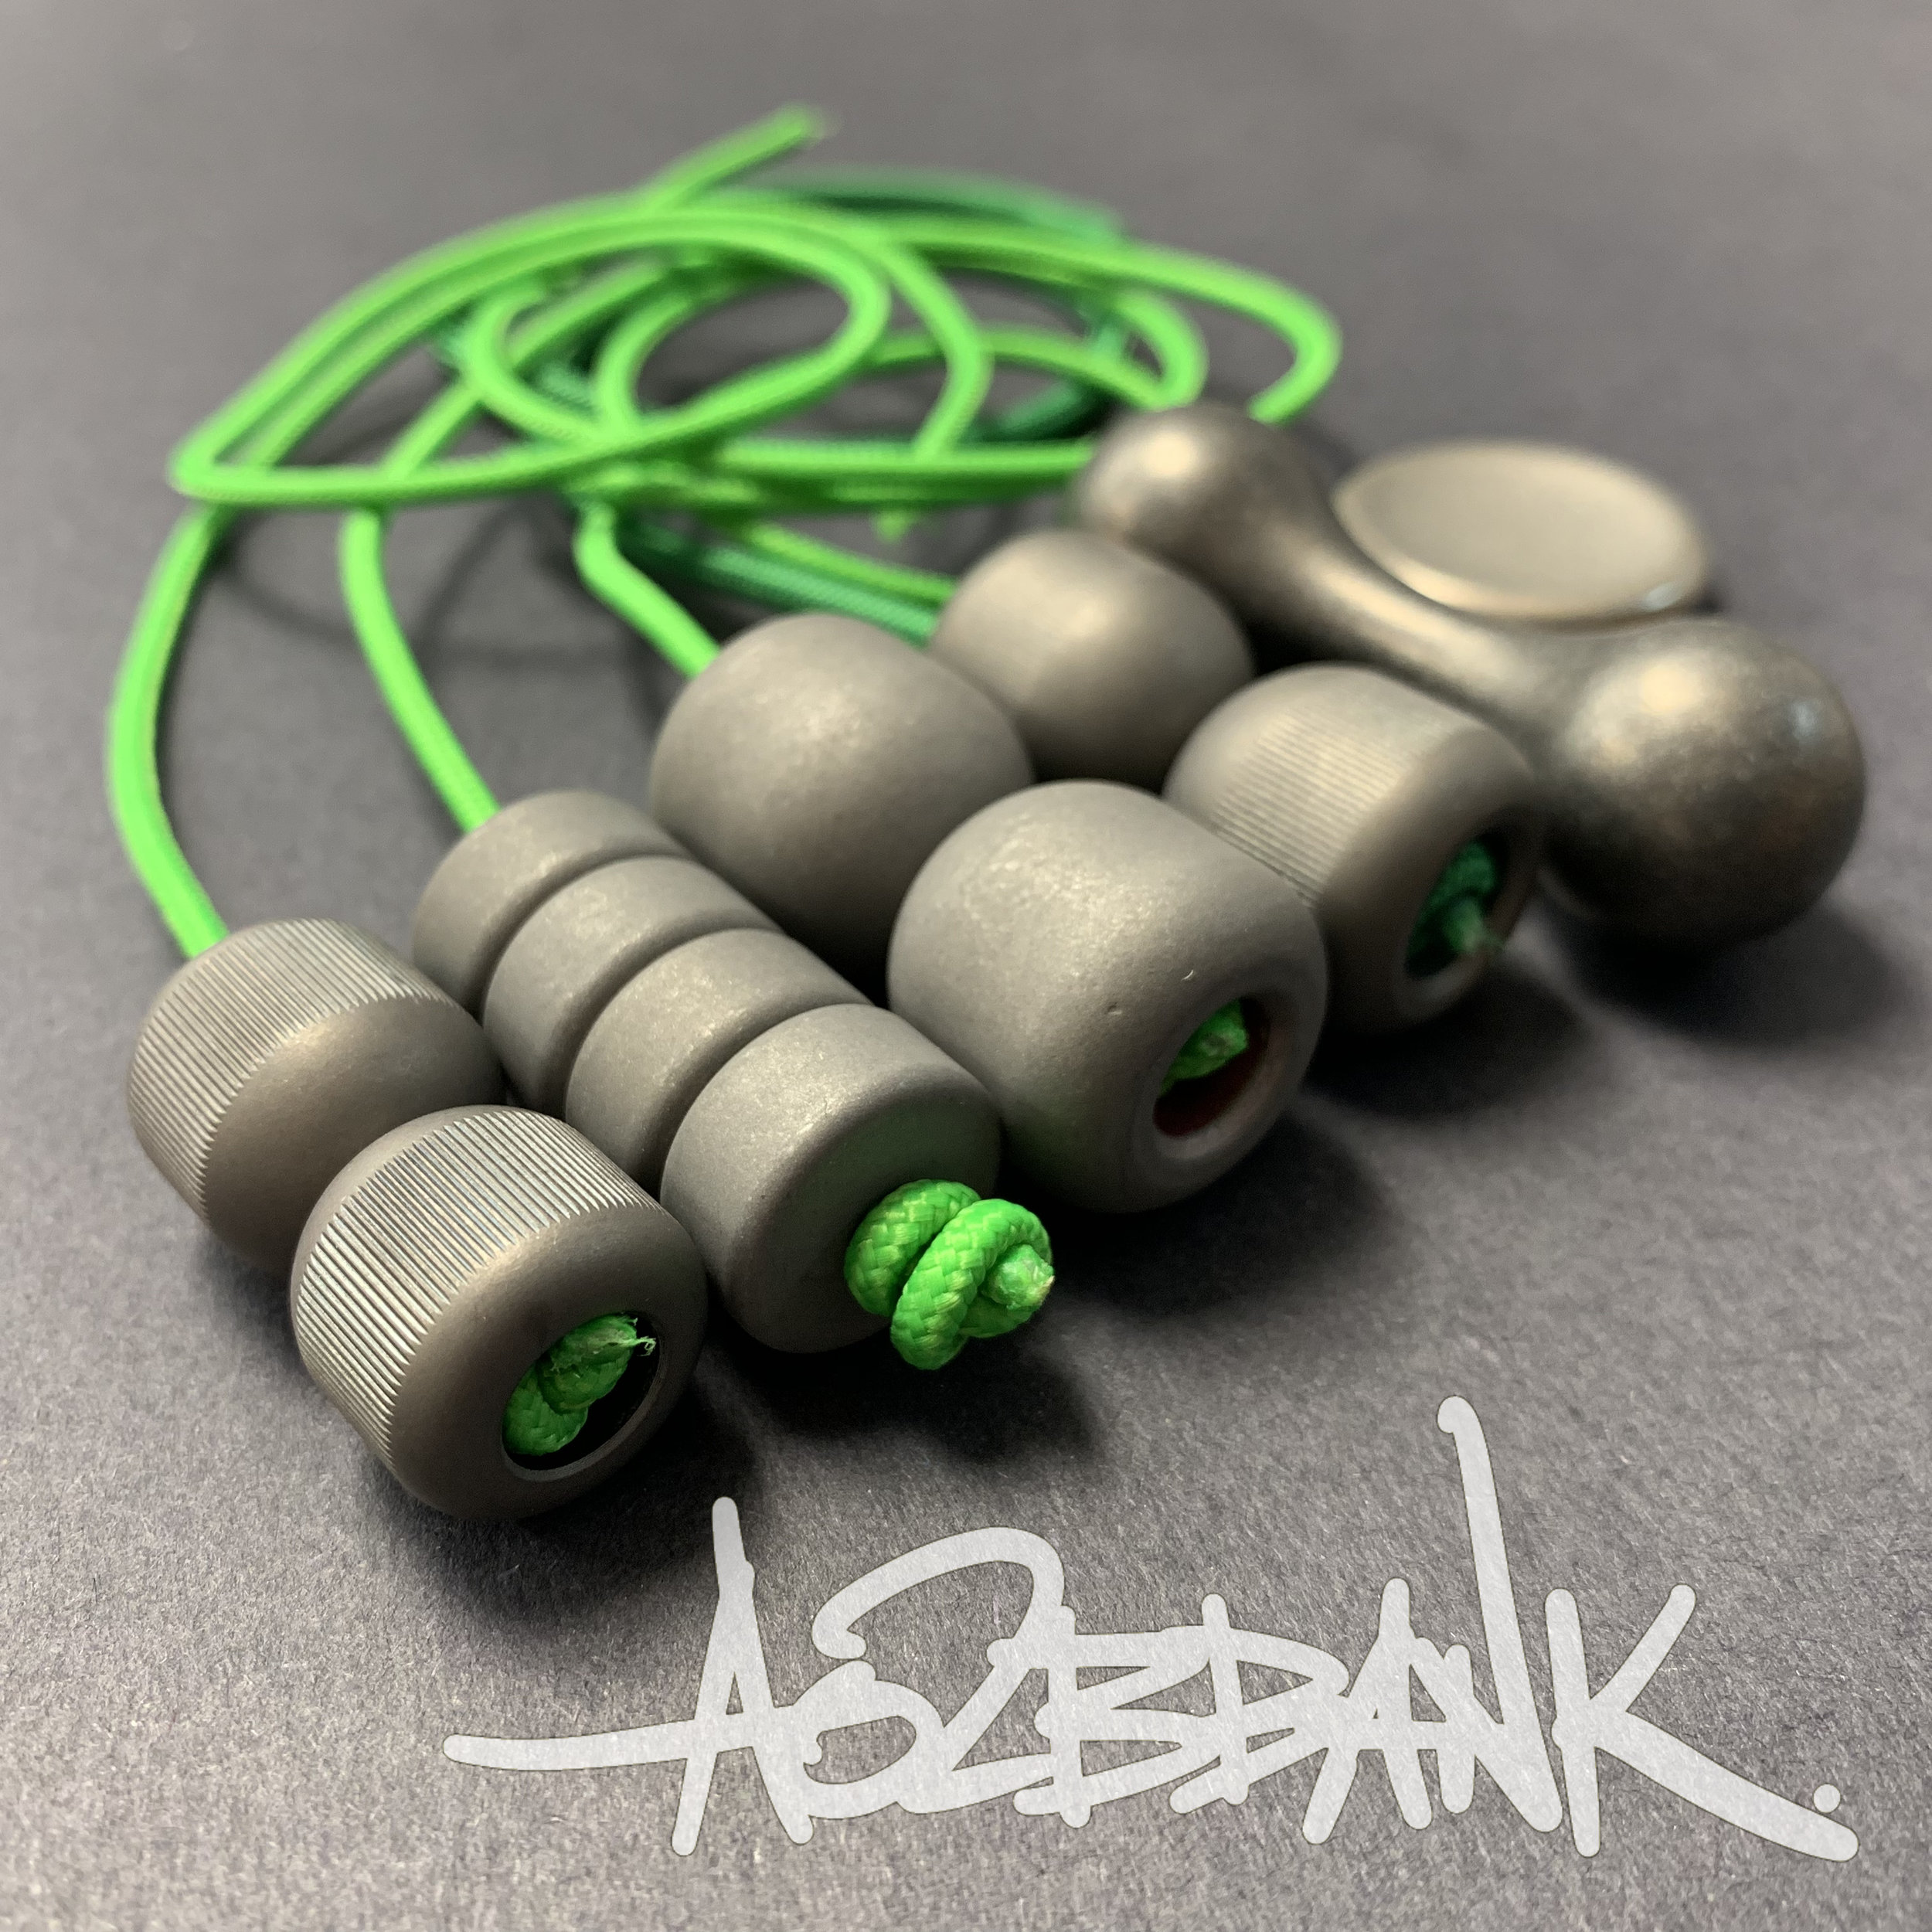 AO2 B Bank aroundsquare begleri.jpeg